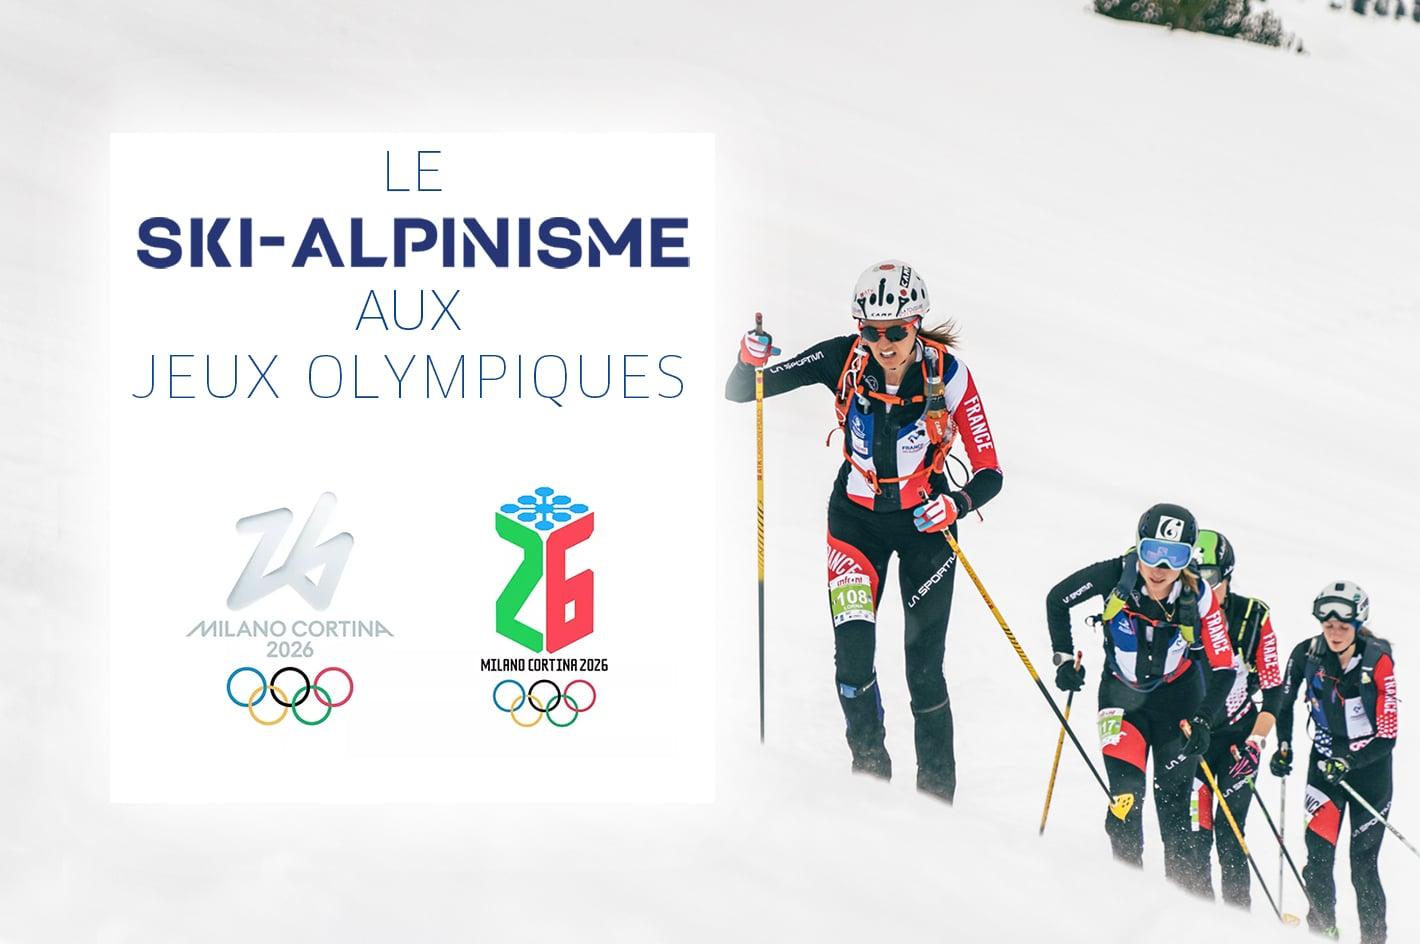 Ski-alpinisme olympique